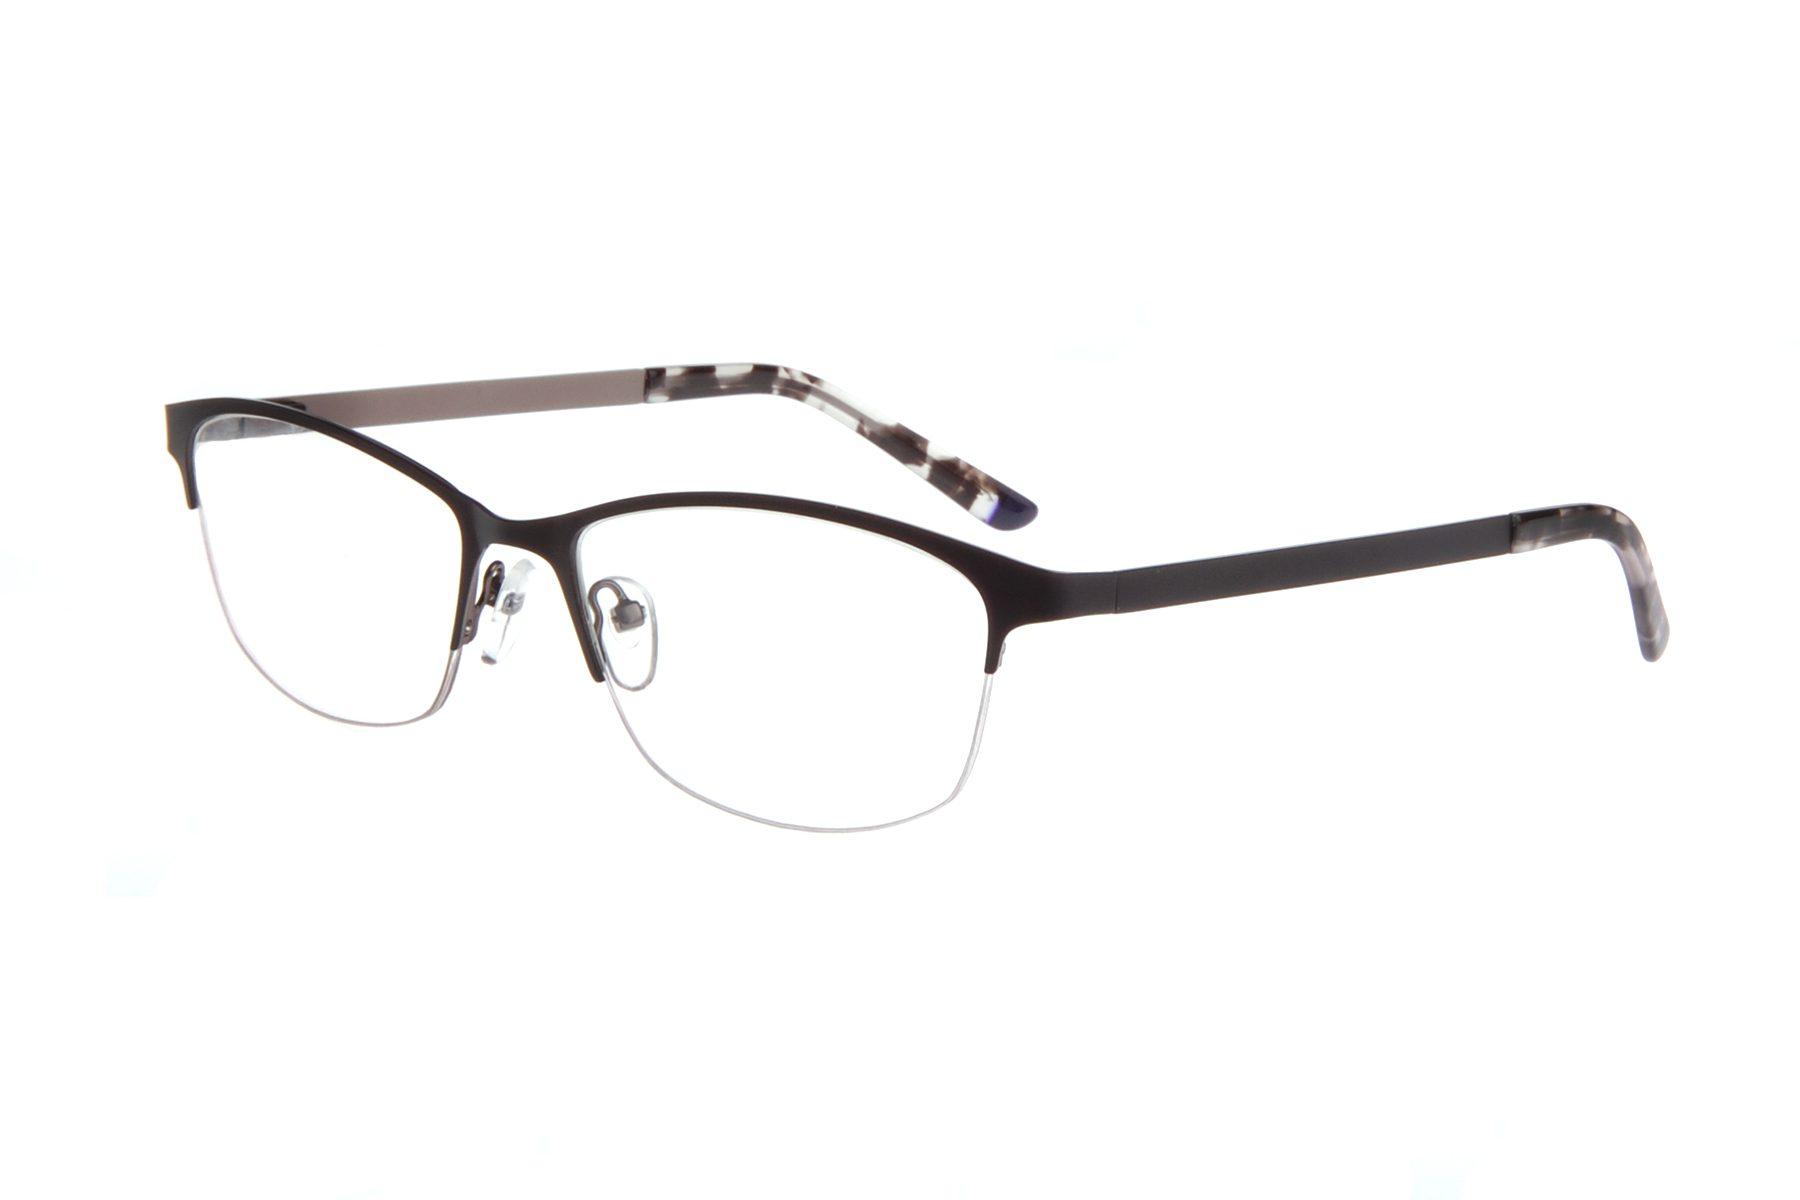 d162d26425 CHIC TIFFANY MATT BLACK - Visual Eyes Eyewear